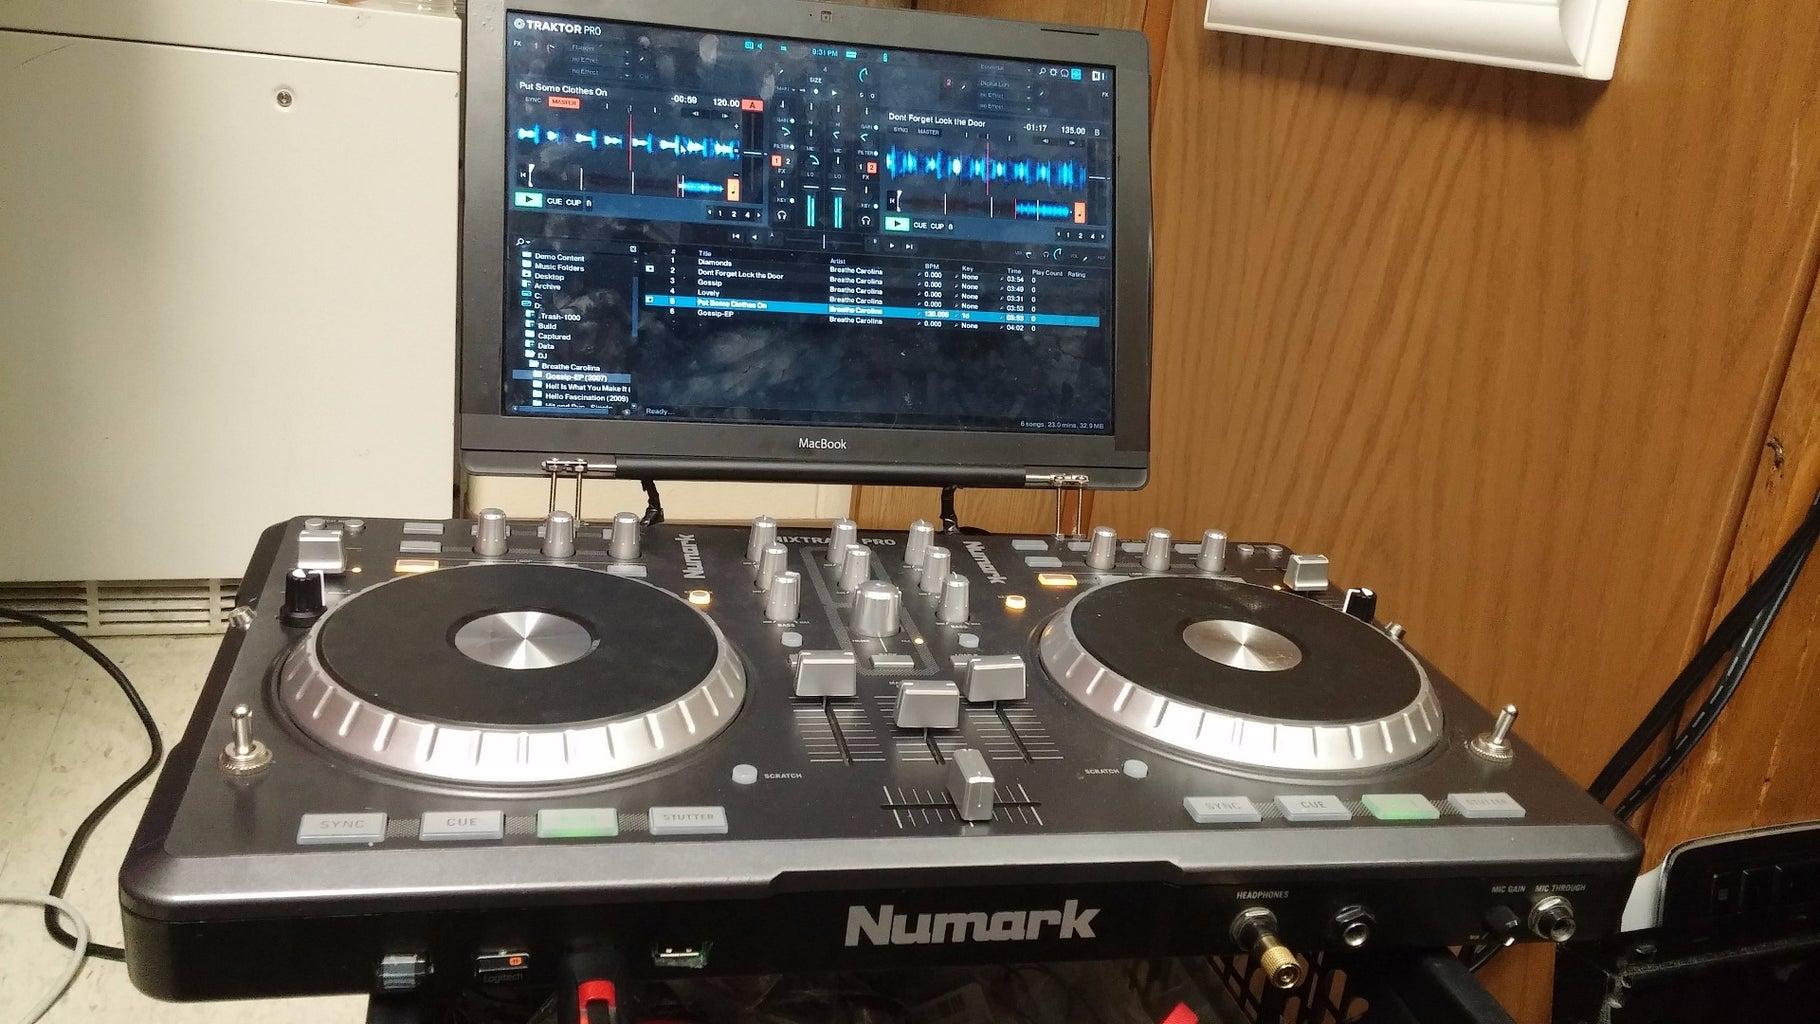 BeatSauce - a Laptop Midi Controller Hybrid